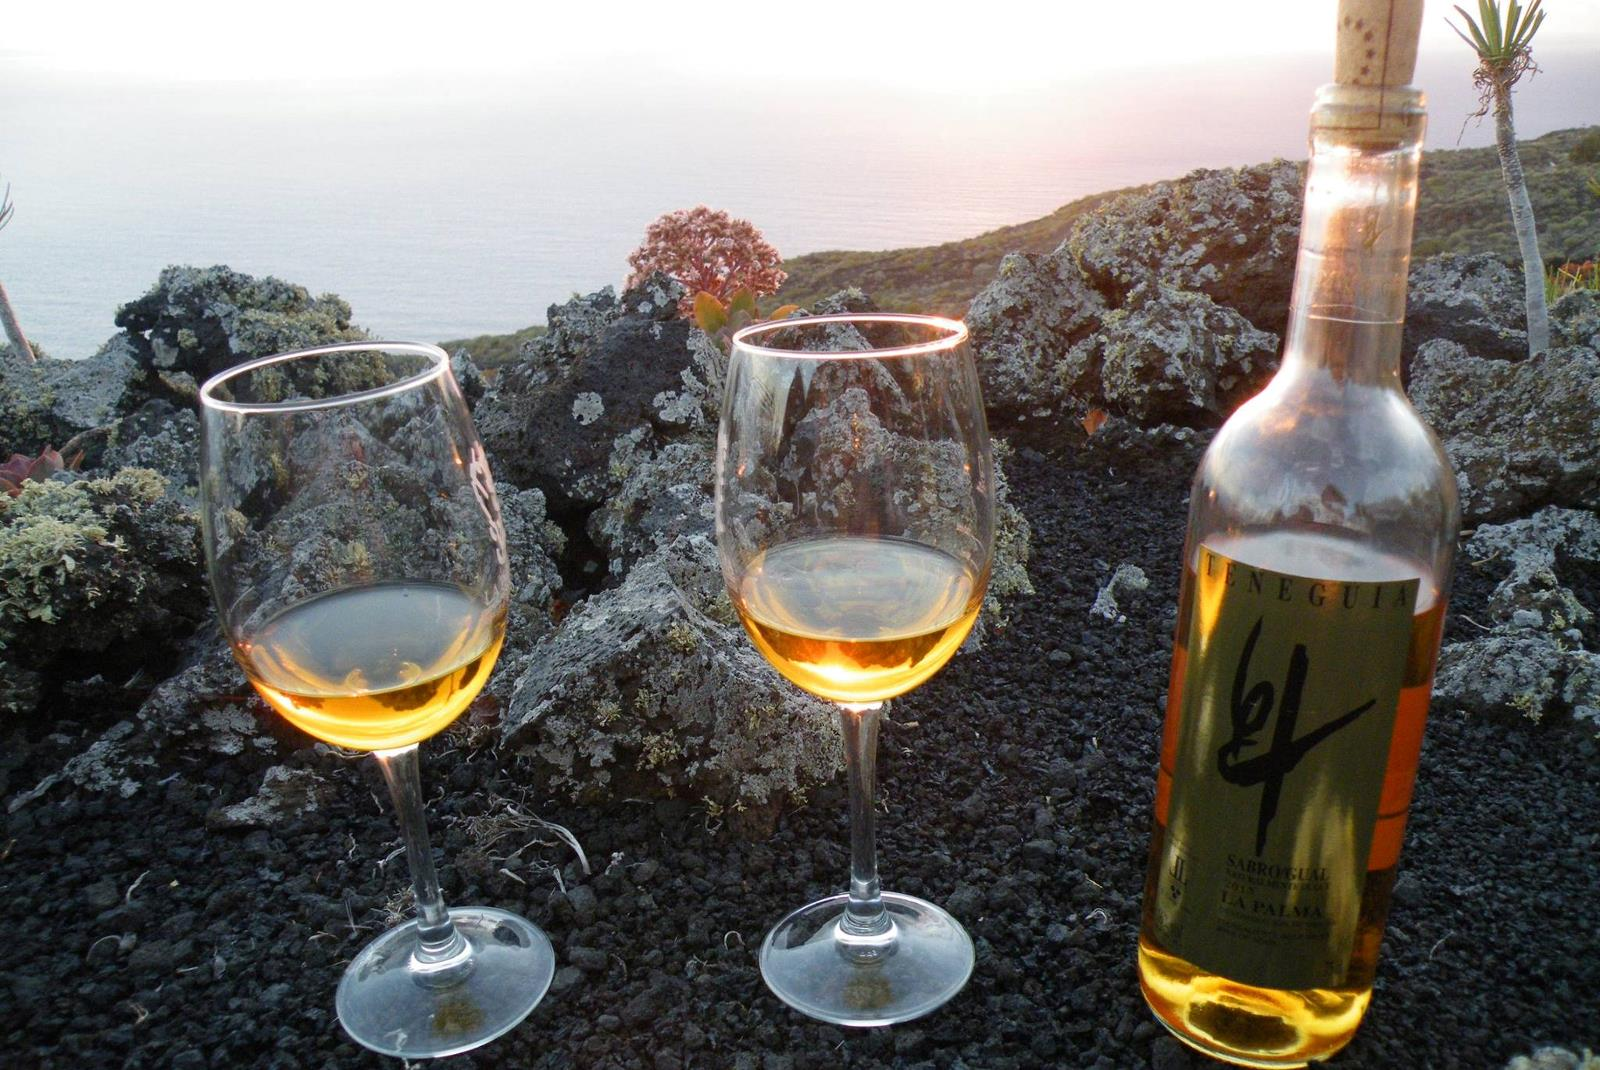 Visit-Bodegas-Teneguia-winery-with-wine-Tasting-4